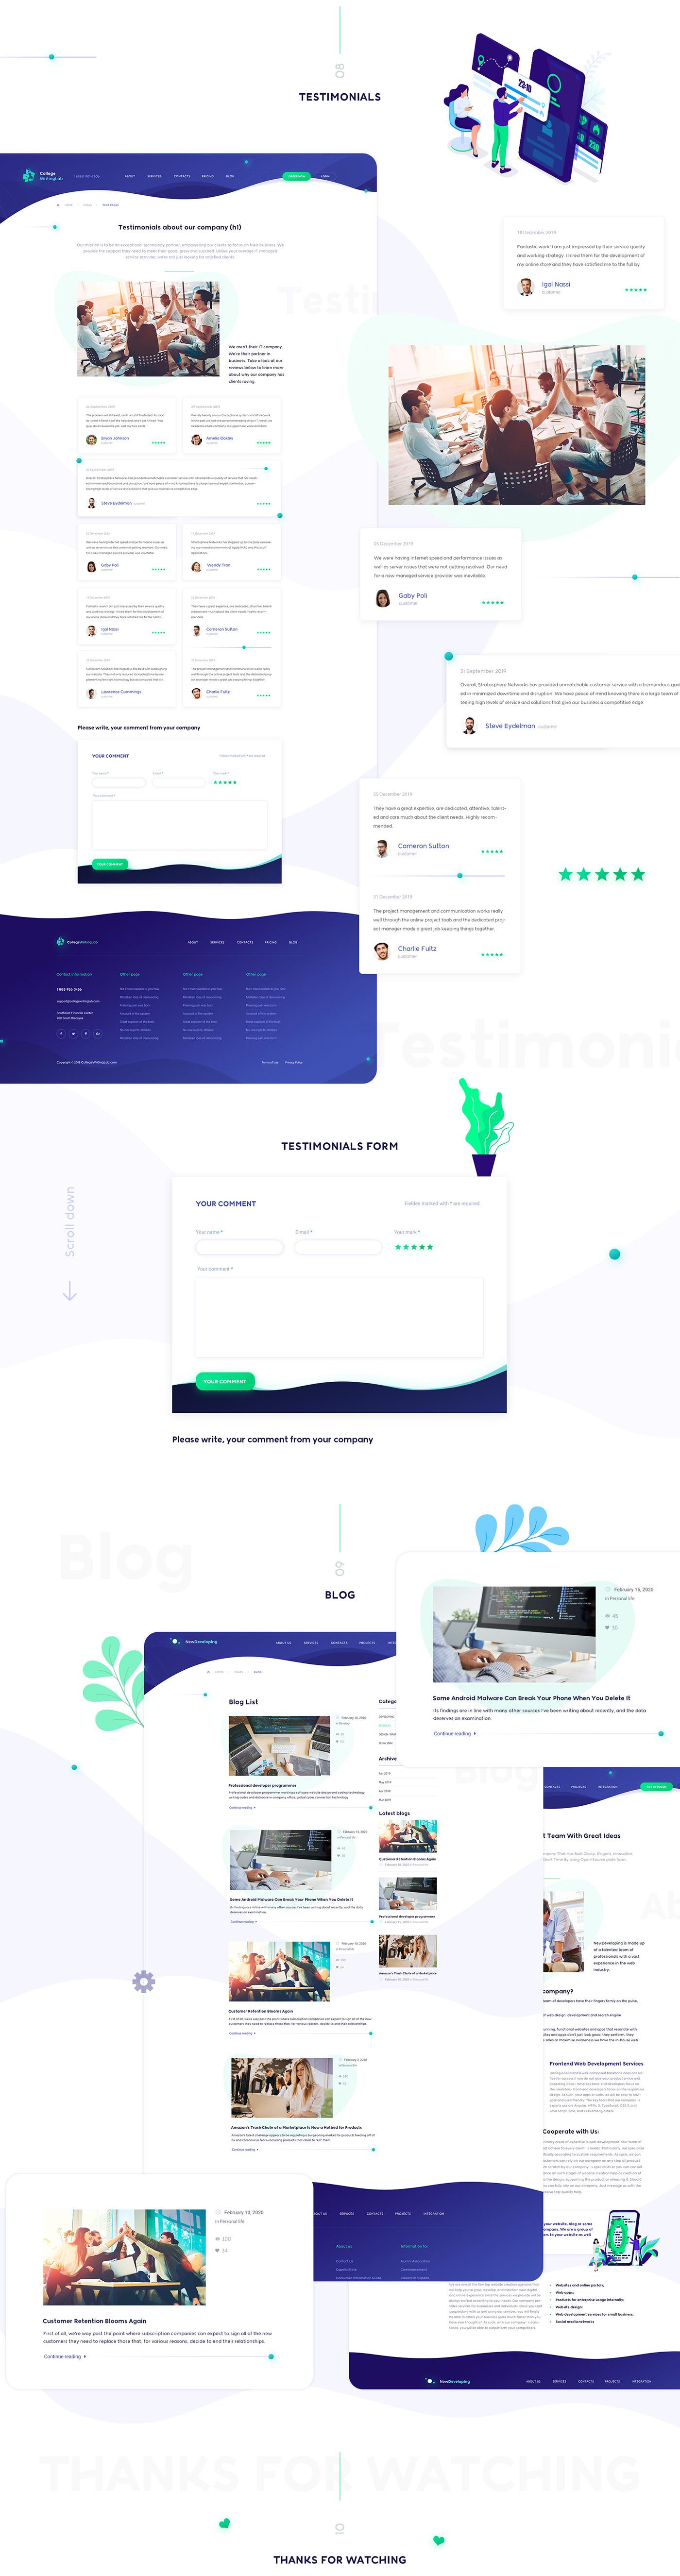 Digital Web Agency - Flat Website Design